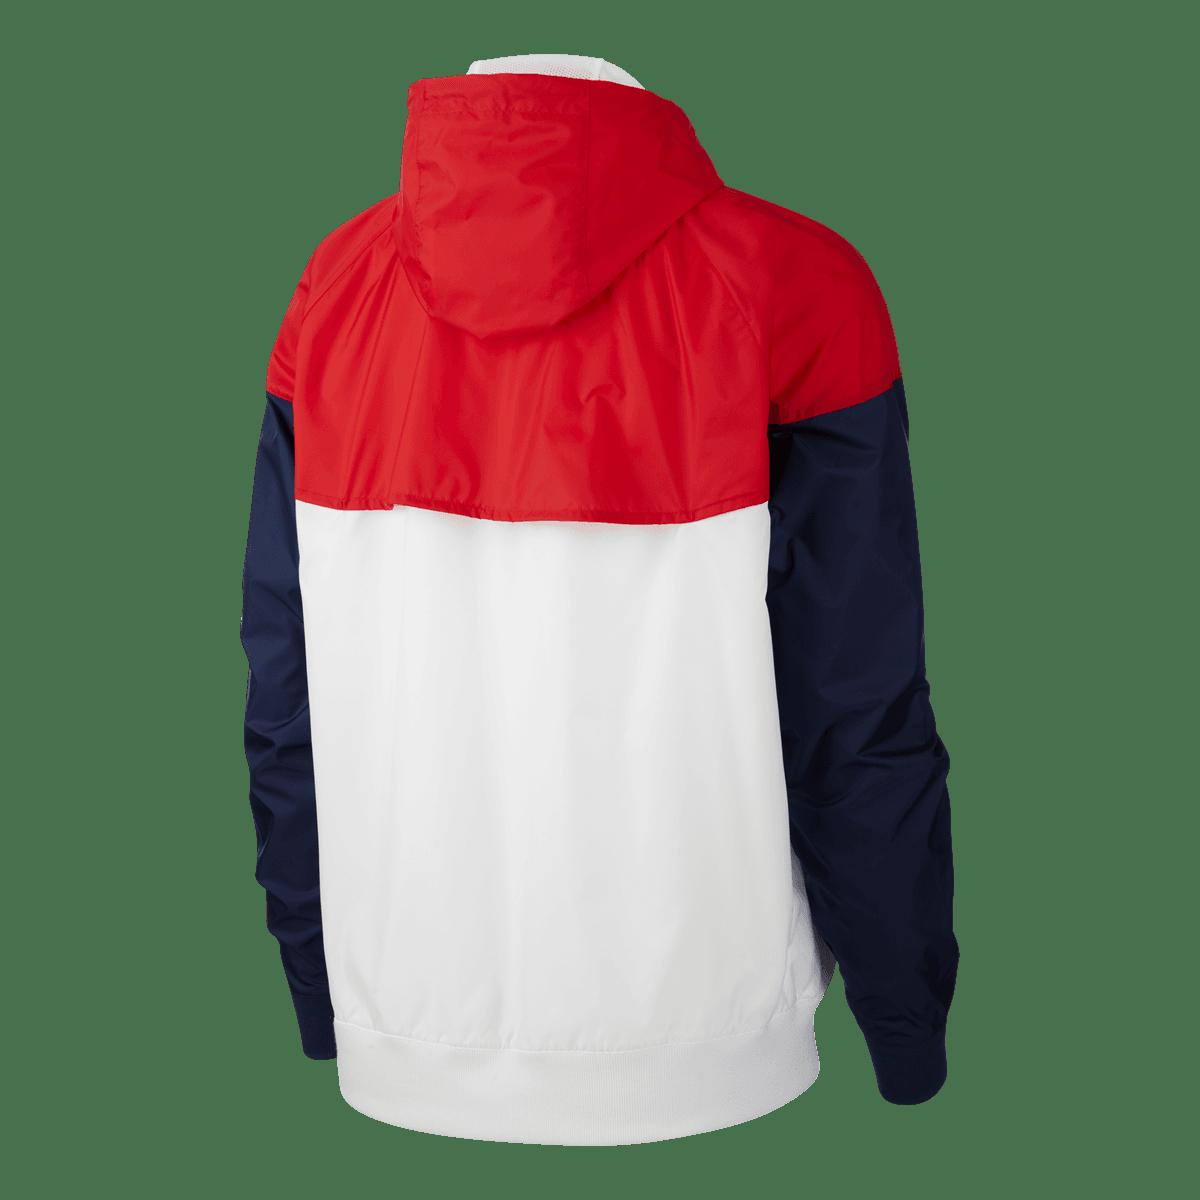 Veste à capuche Nike Sportswear Windrunner blancrouge